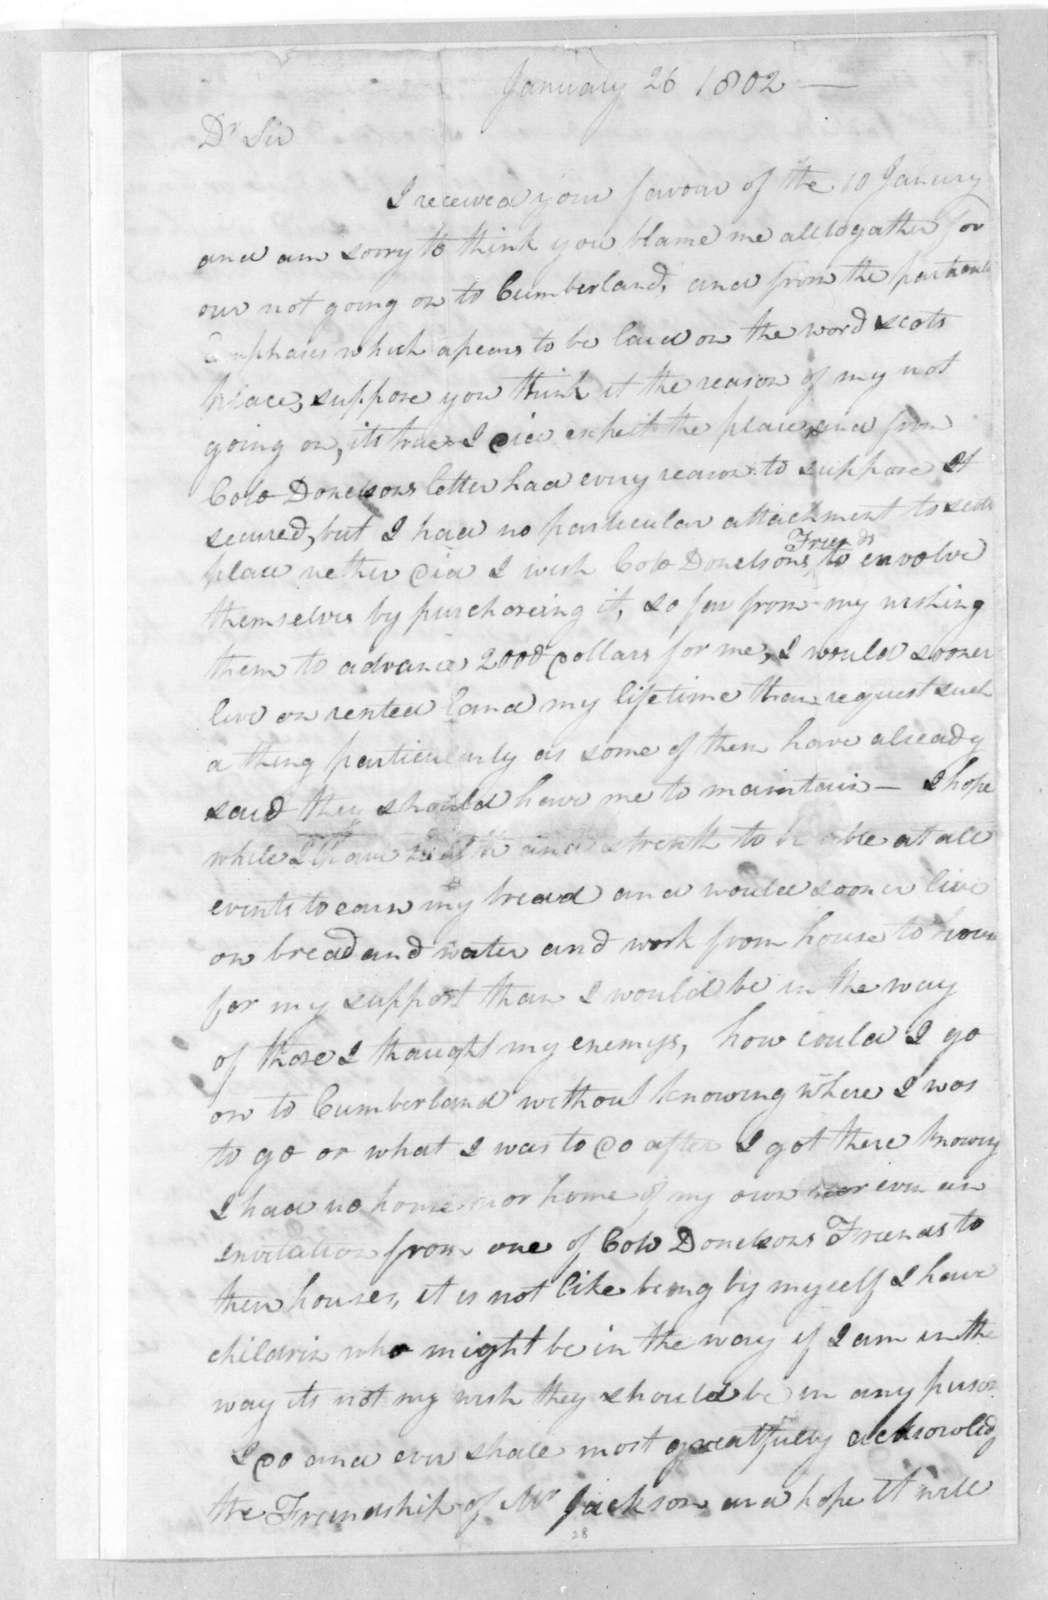 Elizabeth Glasgow Donelson to Andrew Jackson, January 26, 1802